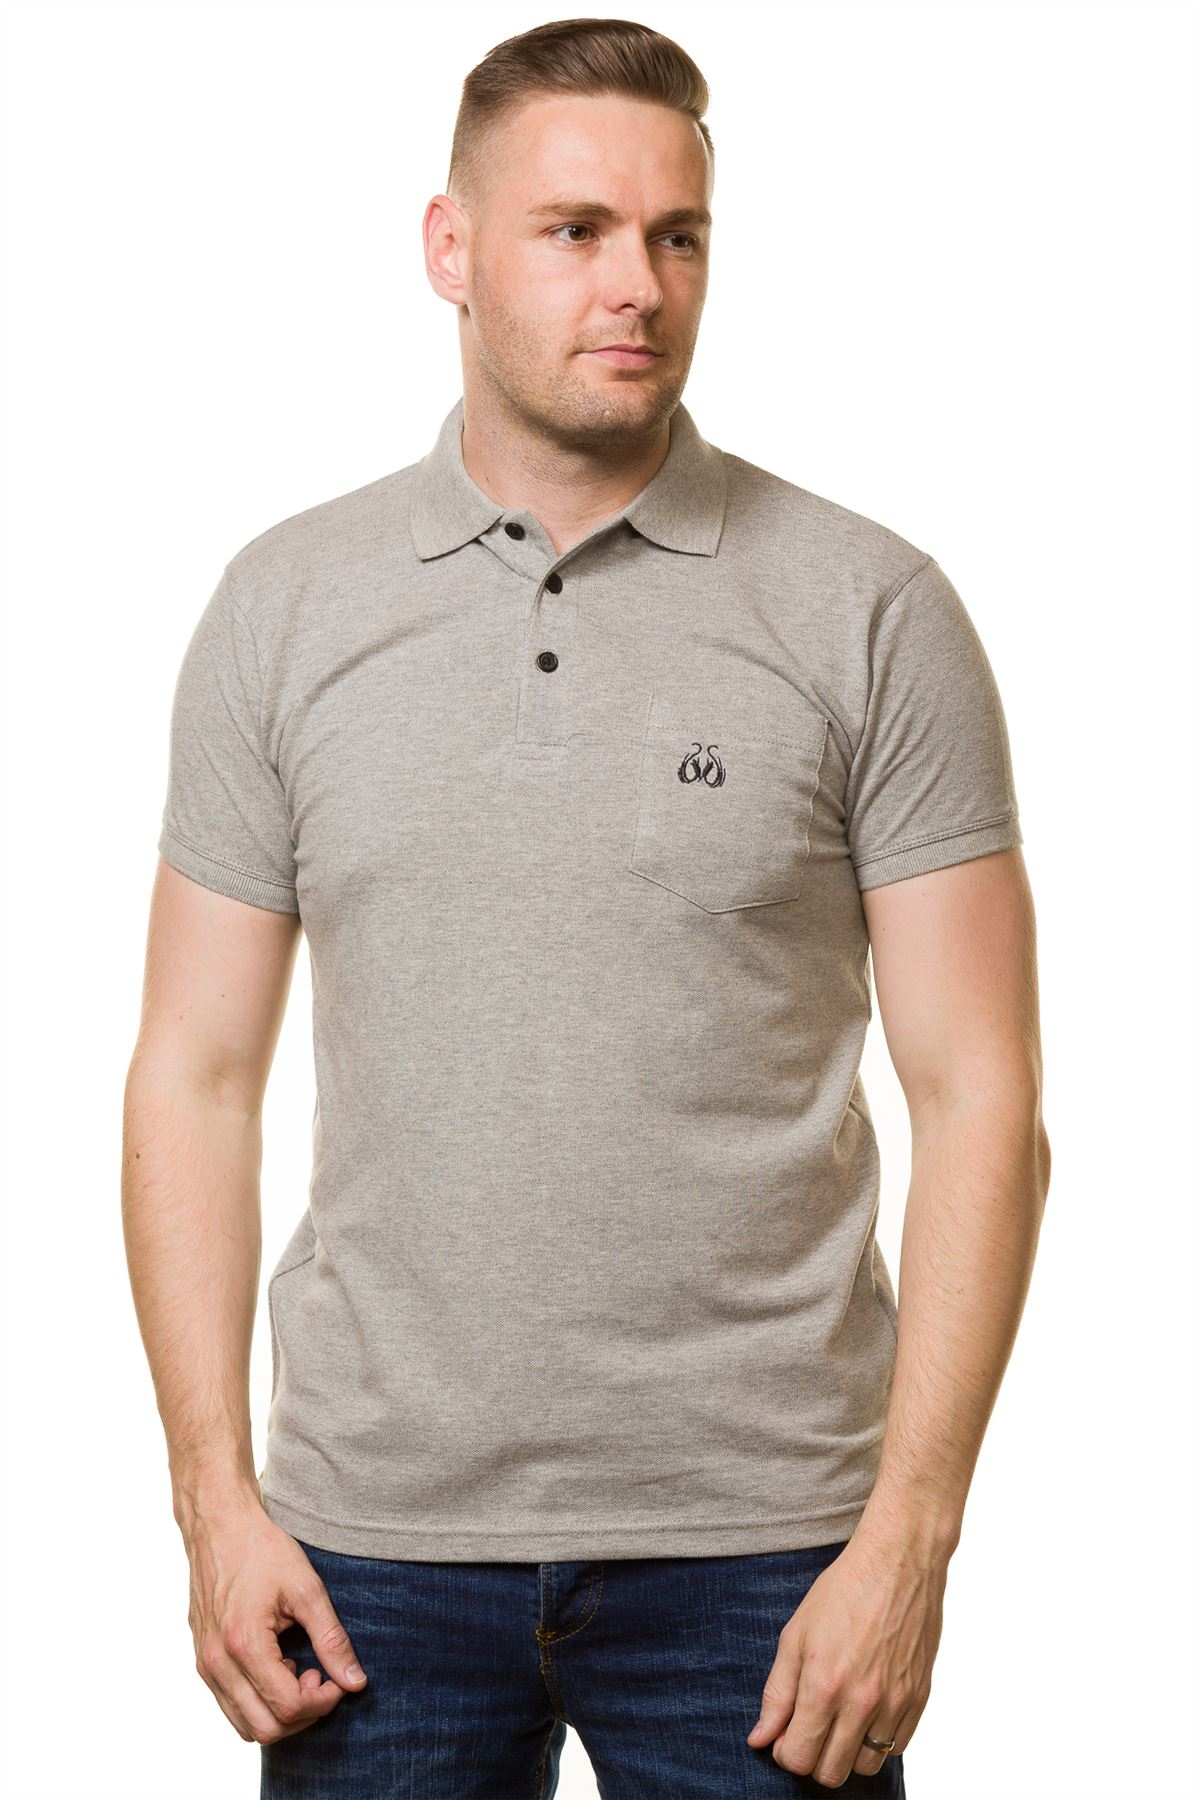 Men's T-shirts Cotton Regular fit Branded Plain Polo ...